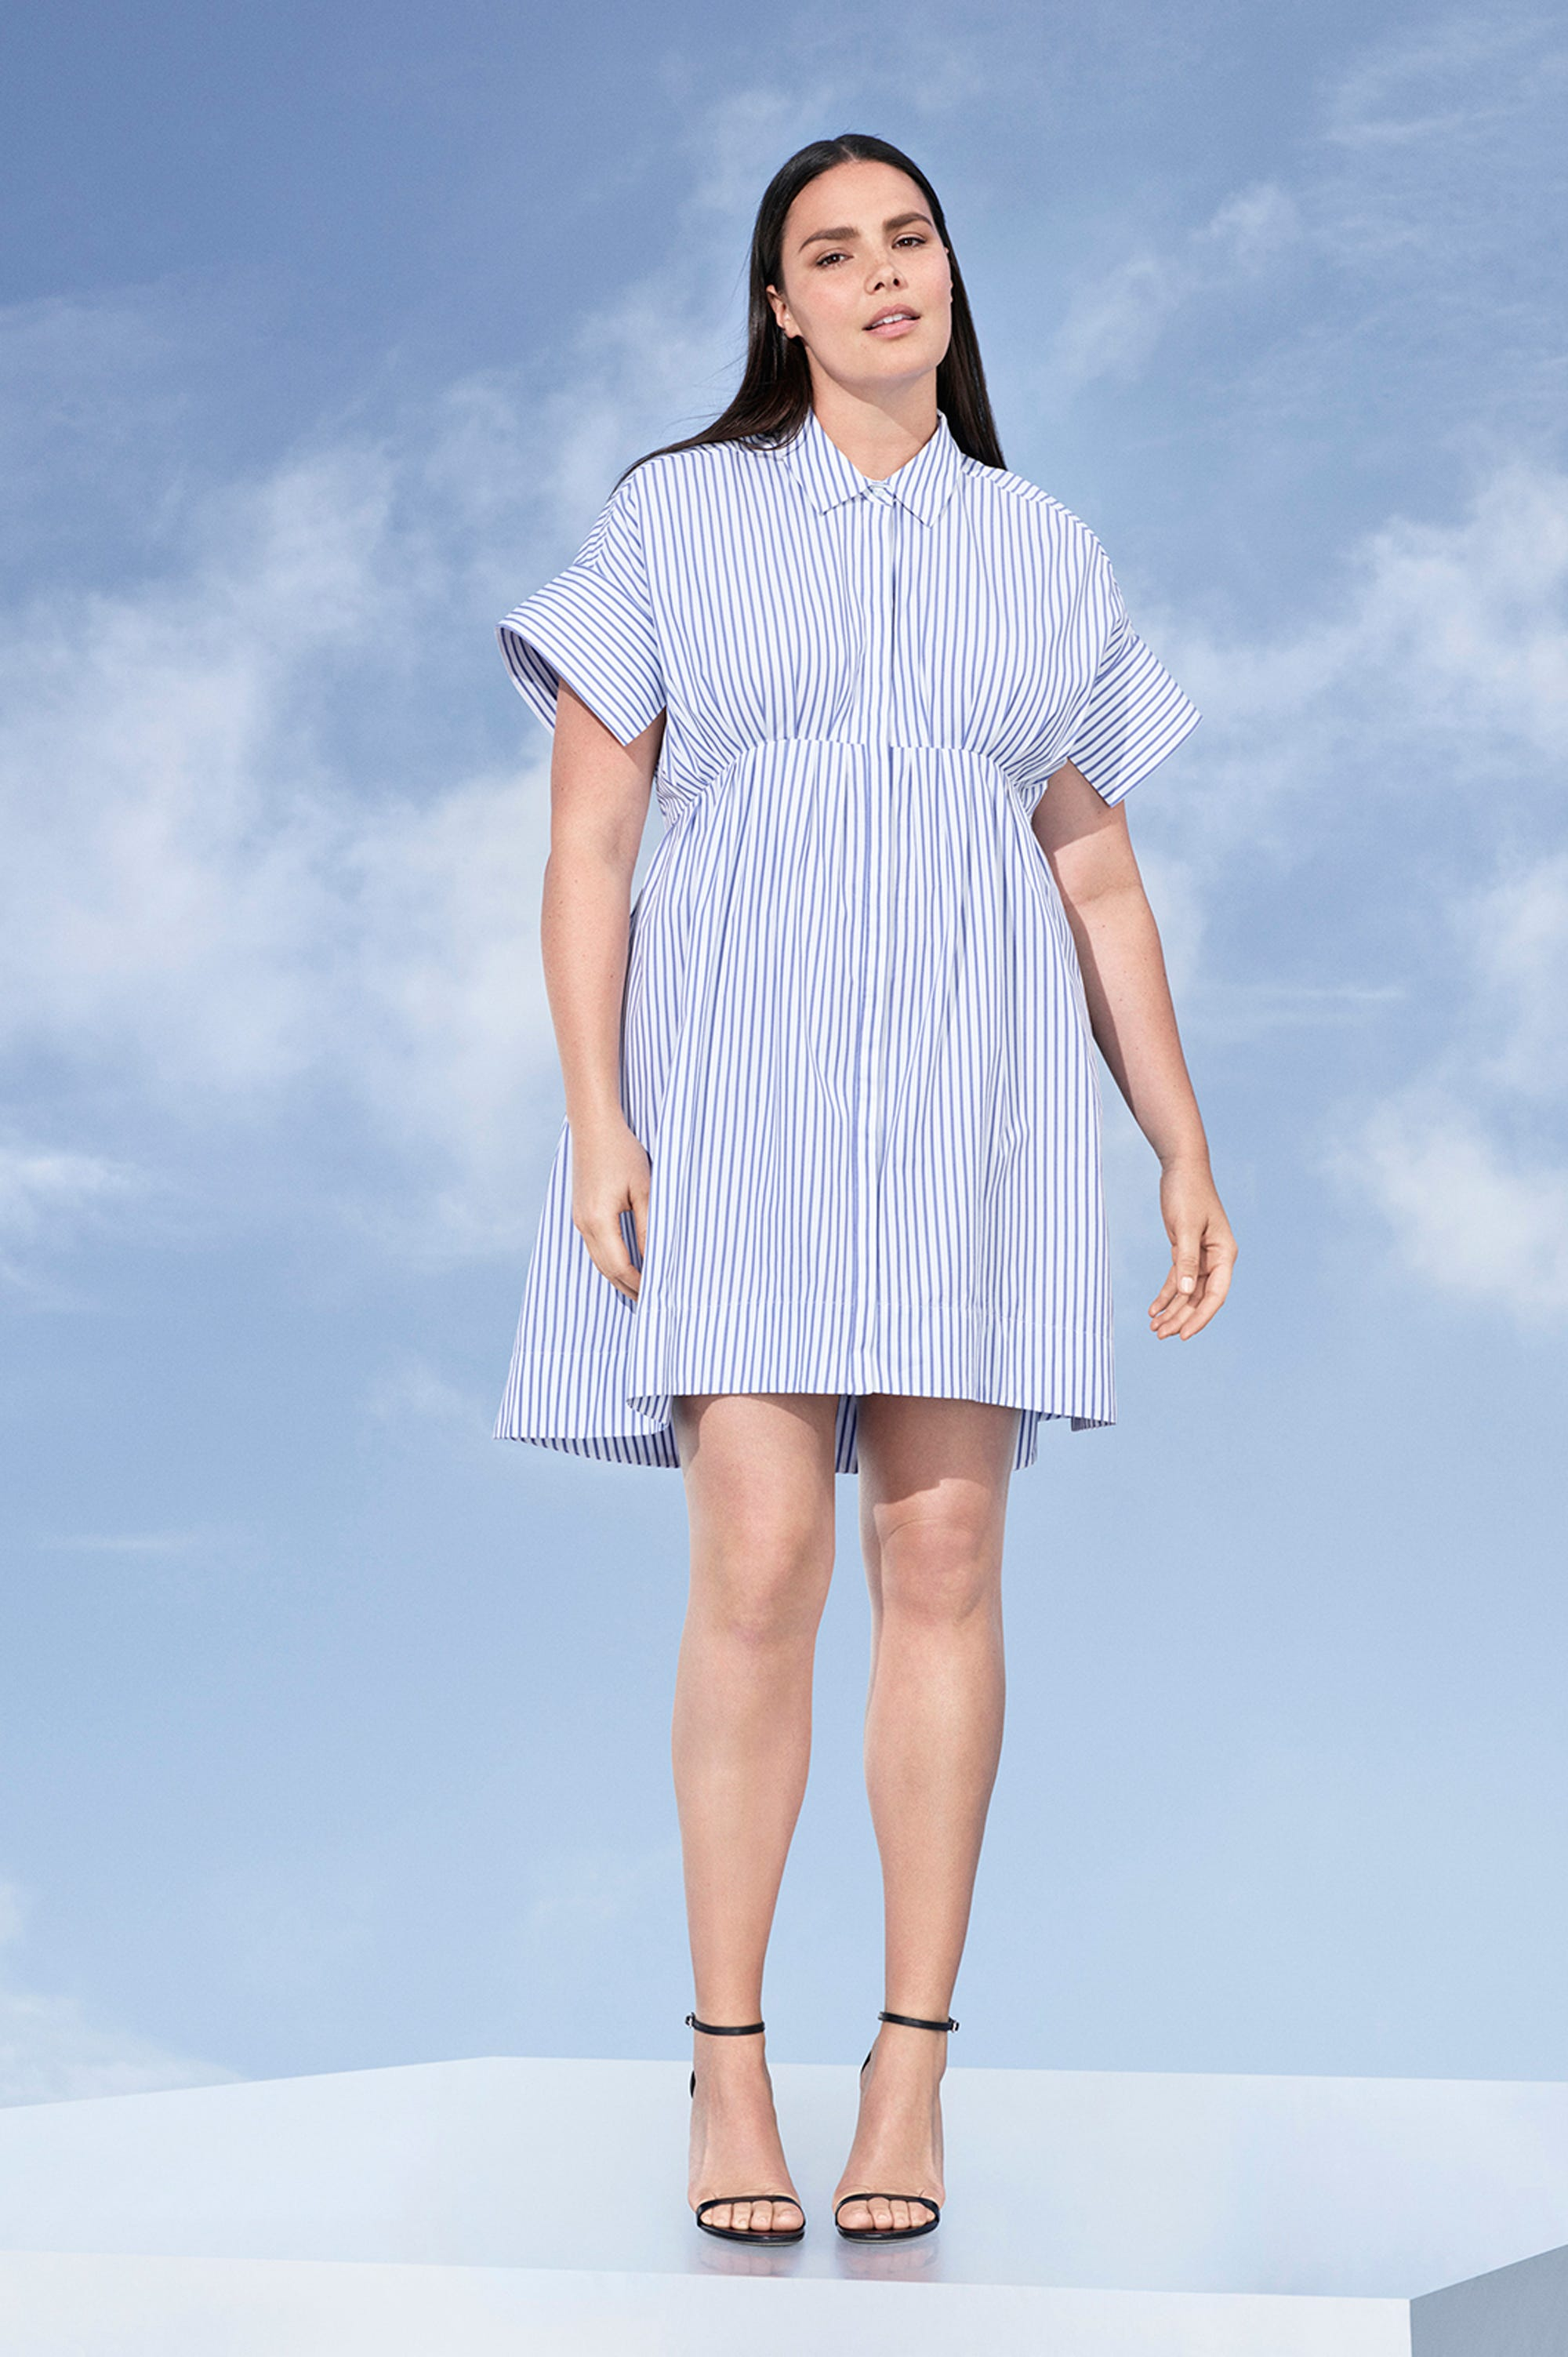 51aa563b4b89 Target Sale Victoria Beckham Clothing Line Discounts